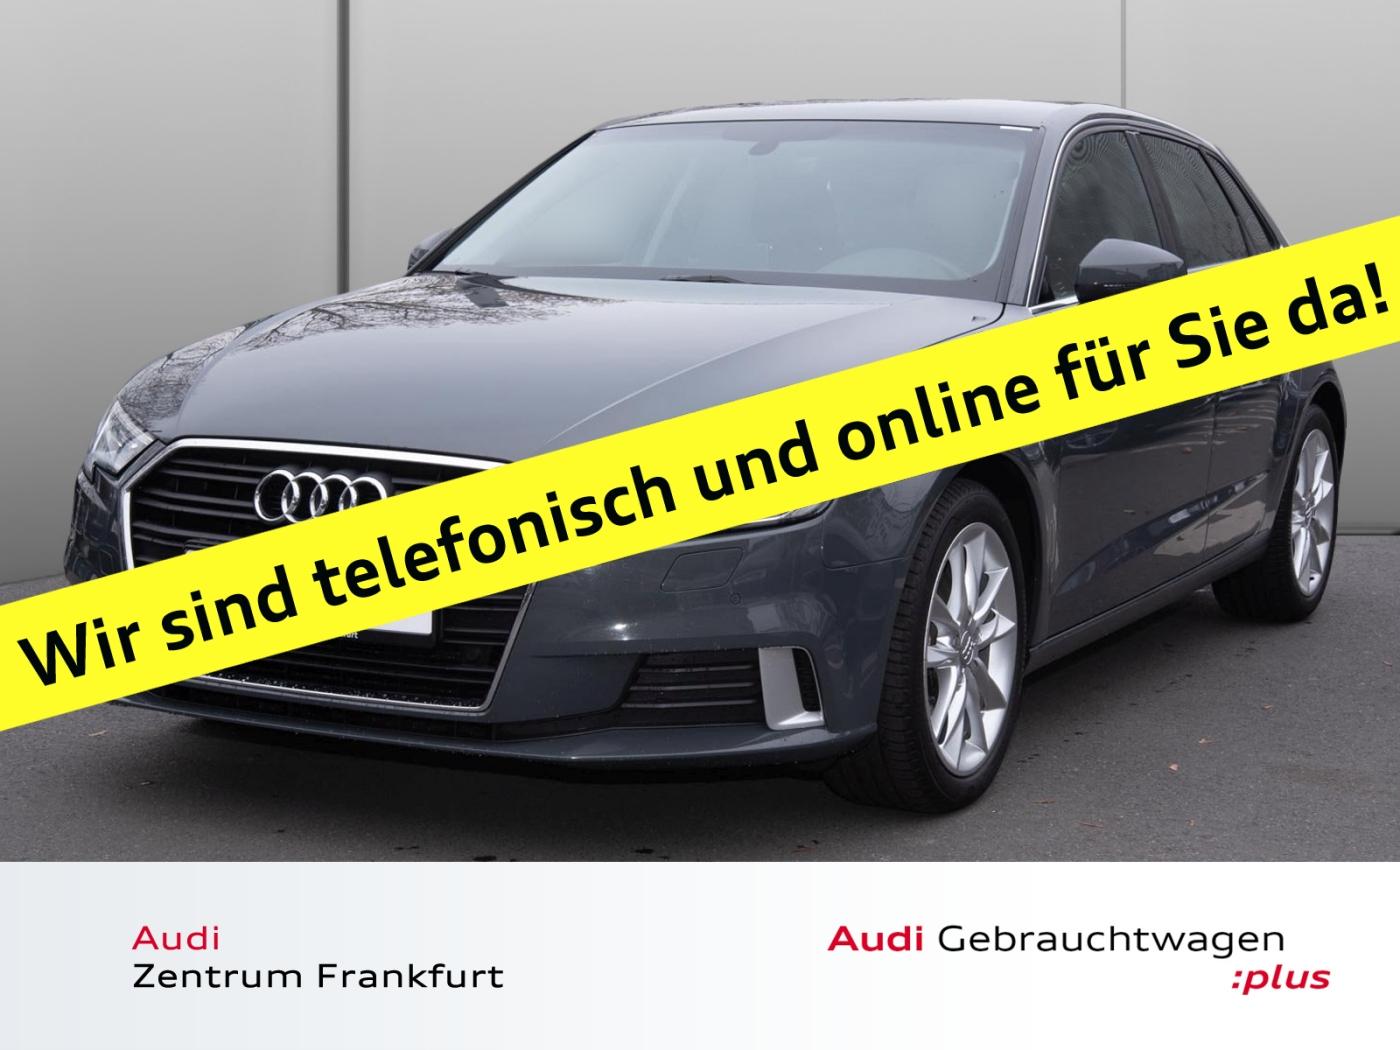 Audi A3 Sportback 1.0 TFSI sport Xenon PDC Sitzheizun, Jahr 2018, Benzin